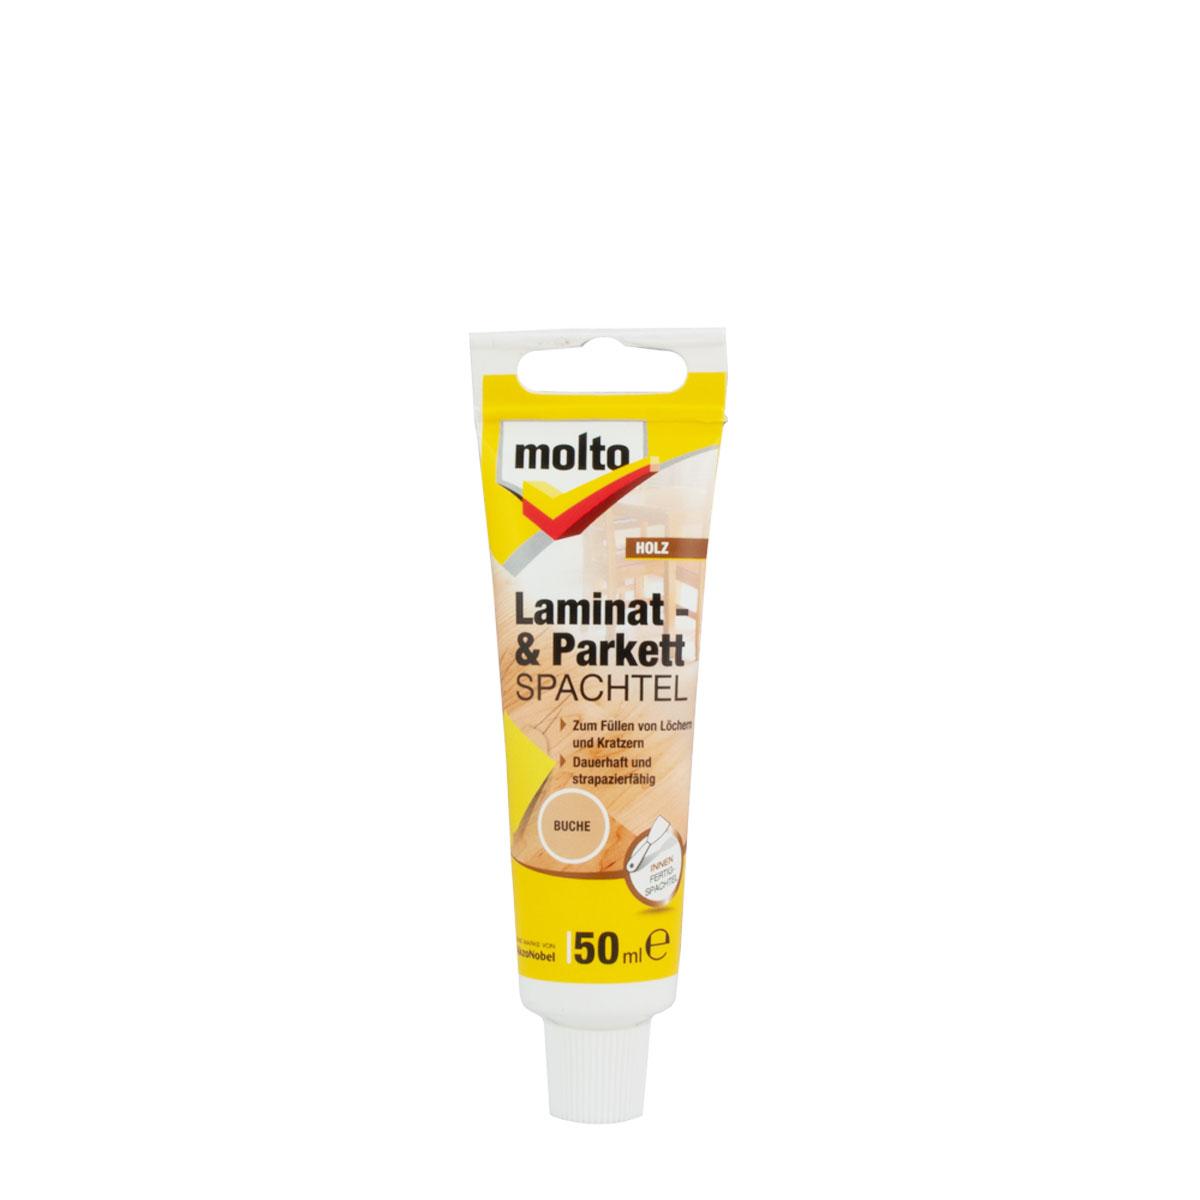 Molto Laminat & Parkett Spachtel Buche 50ml